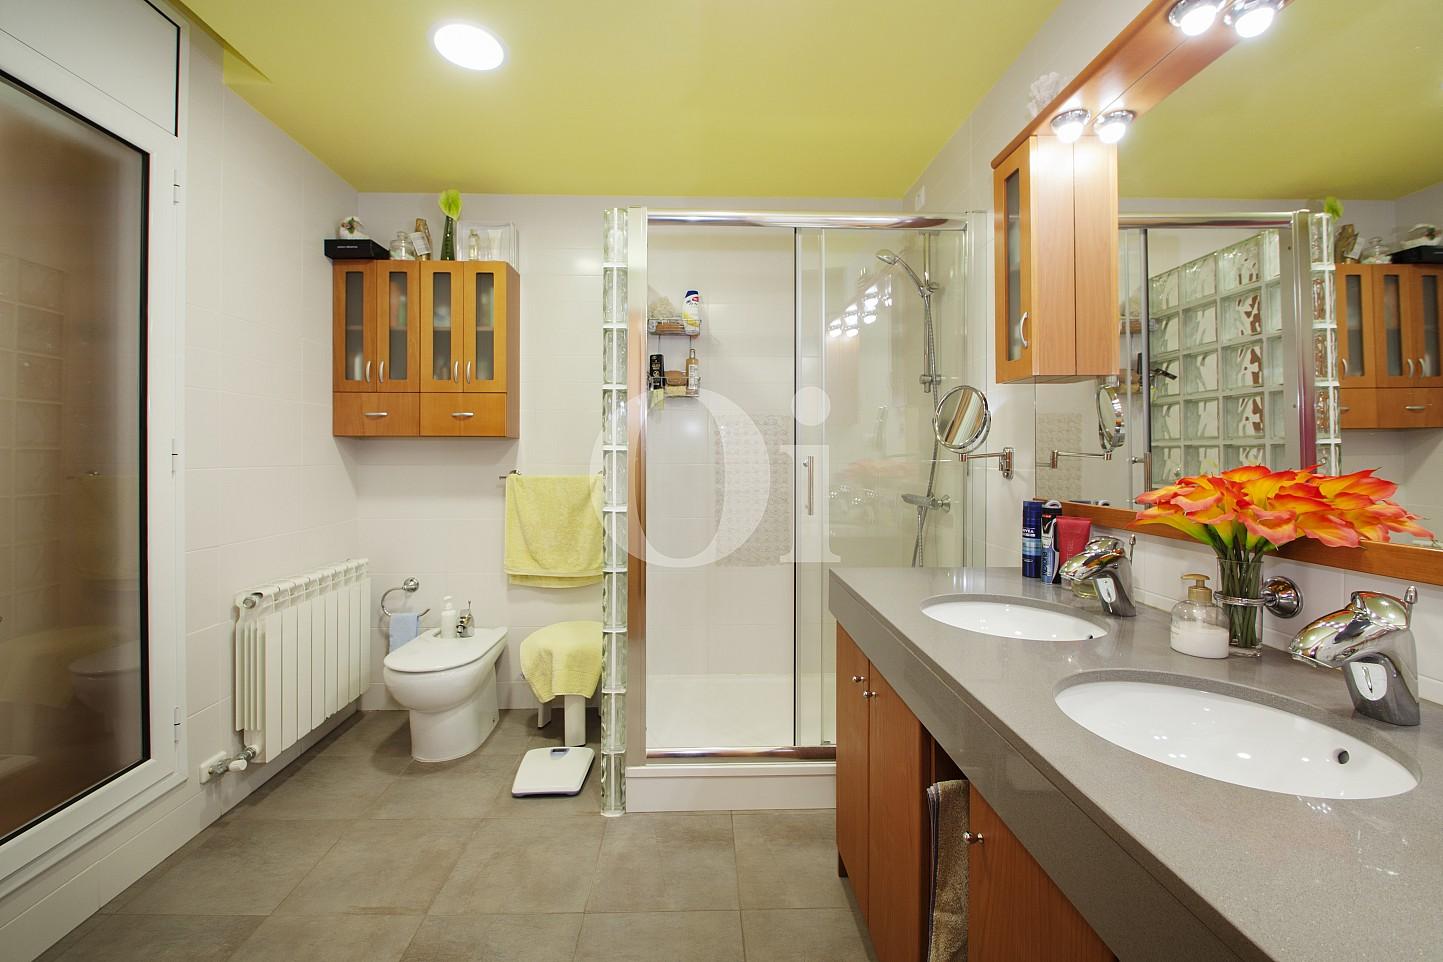 Lavabo de casa en venta en Segur de Calafell, Baix Penedès, Tarragona